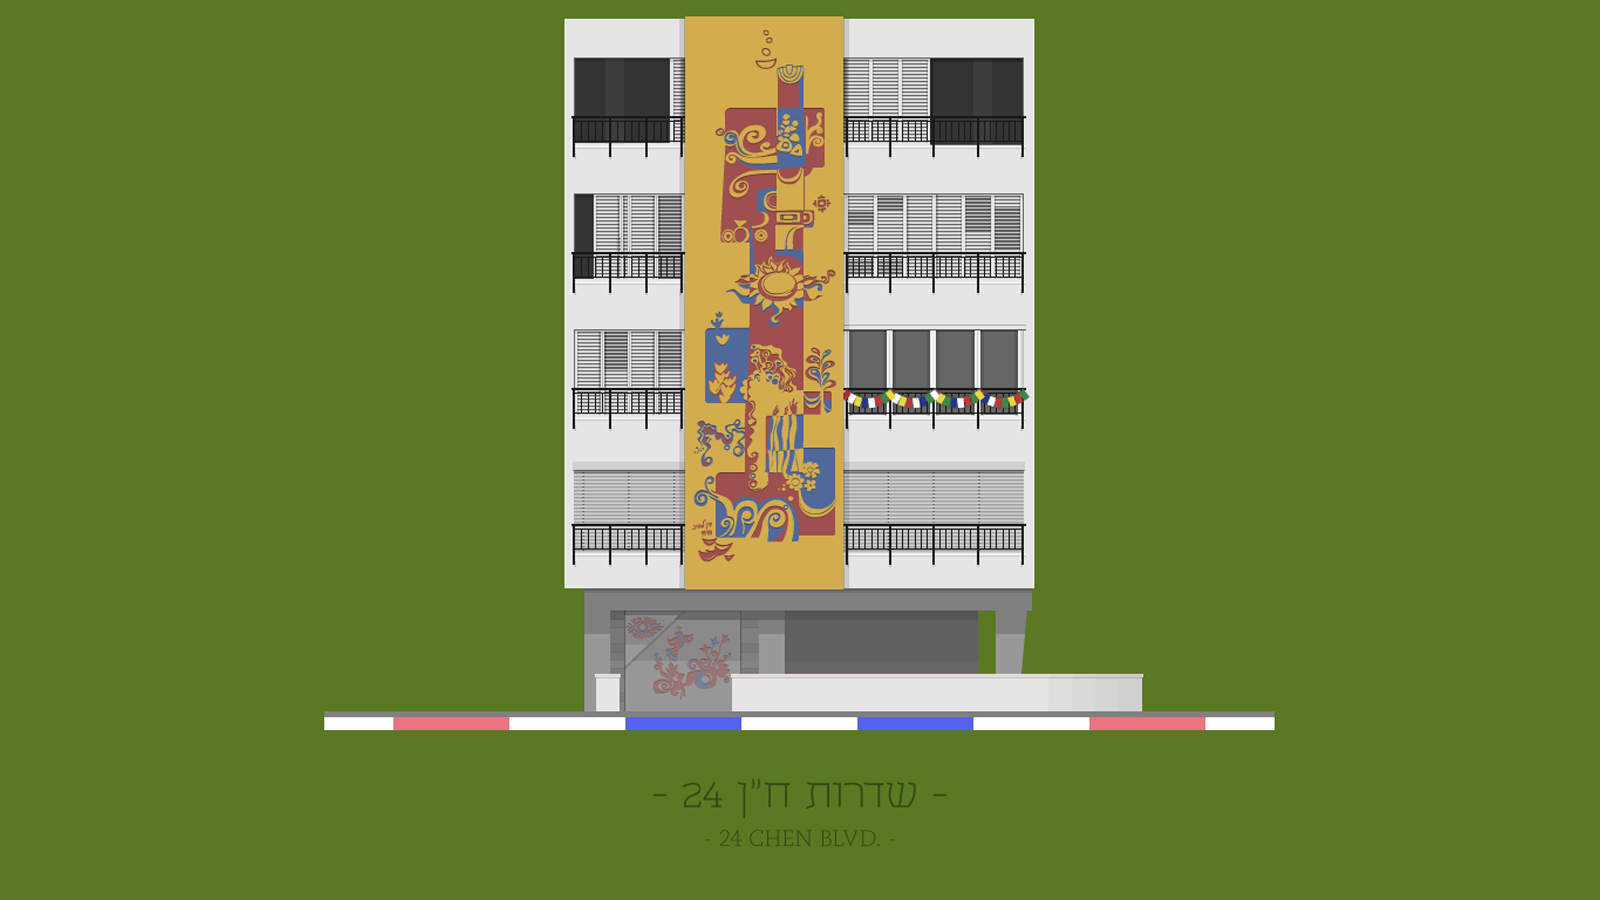 tel-aviv-buildings-4_1600x900